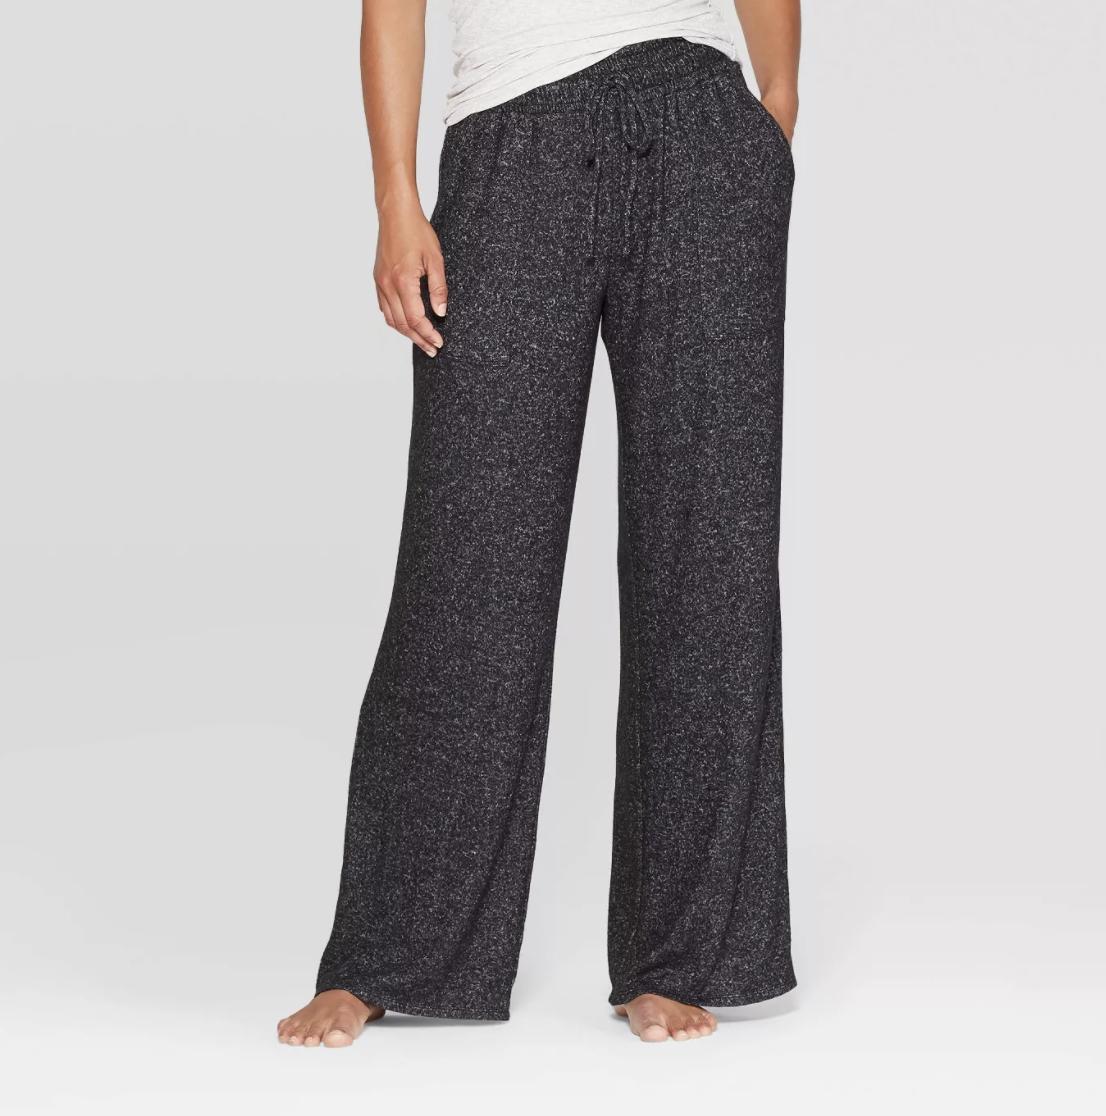 a model wearing grey speckled long pants